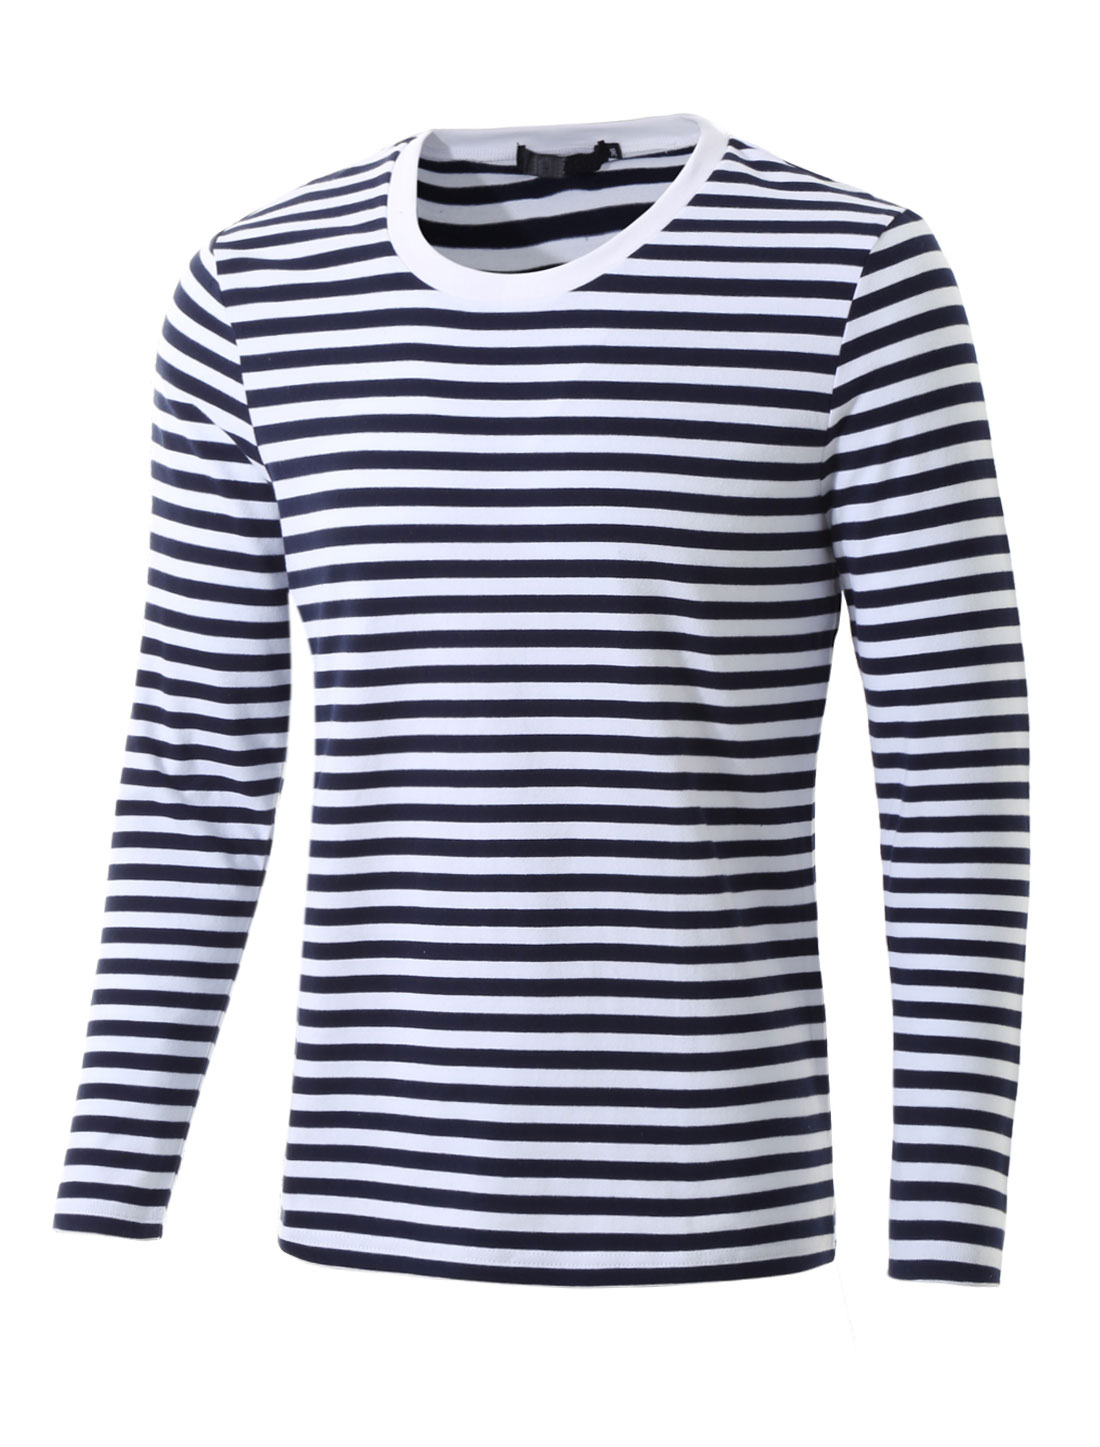 Men Crew Neck Long Sleeve Striped Tee T Shirt Navy Blue XL XL (US 46)